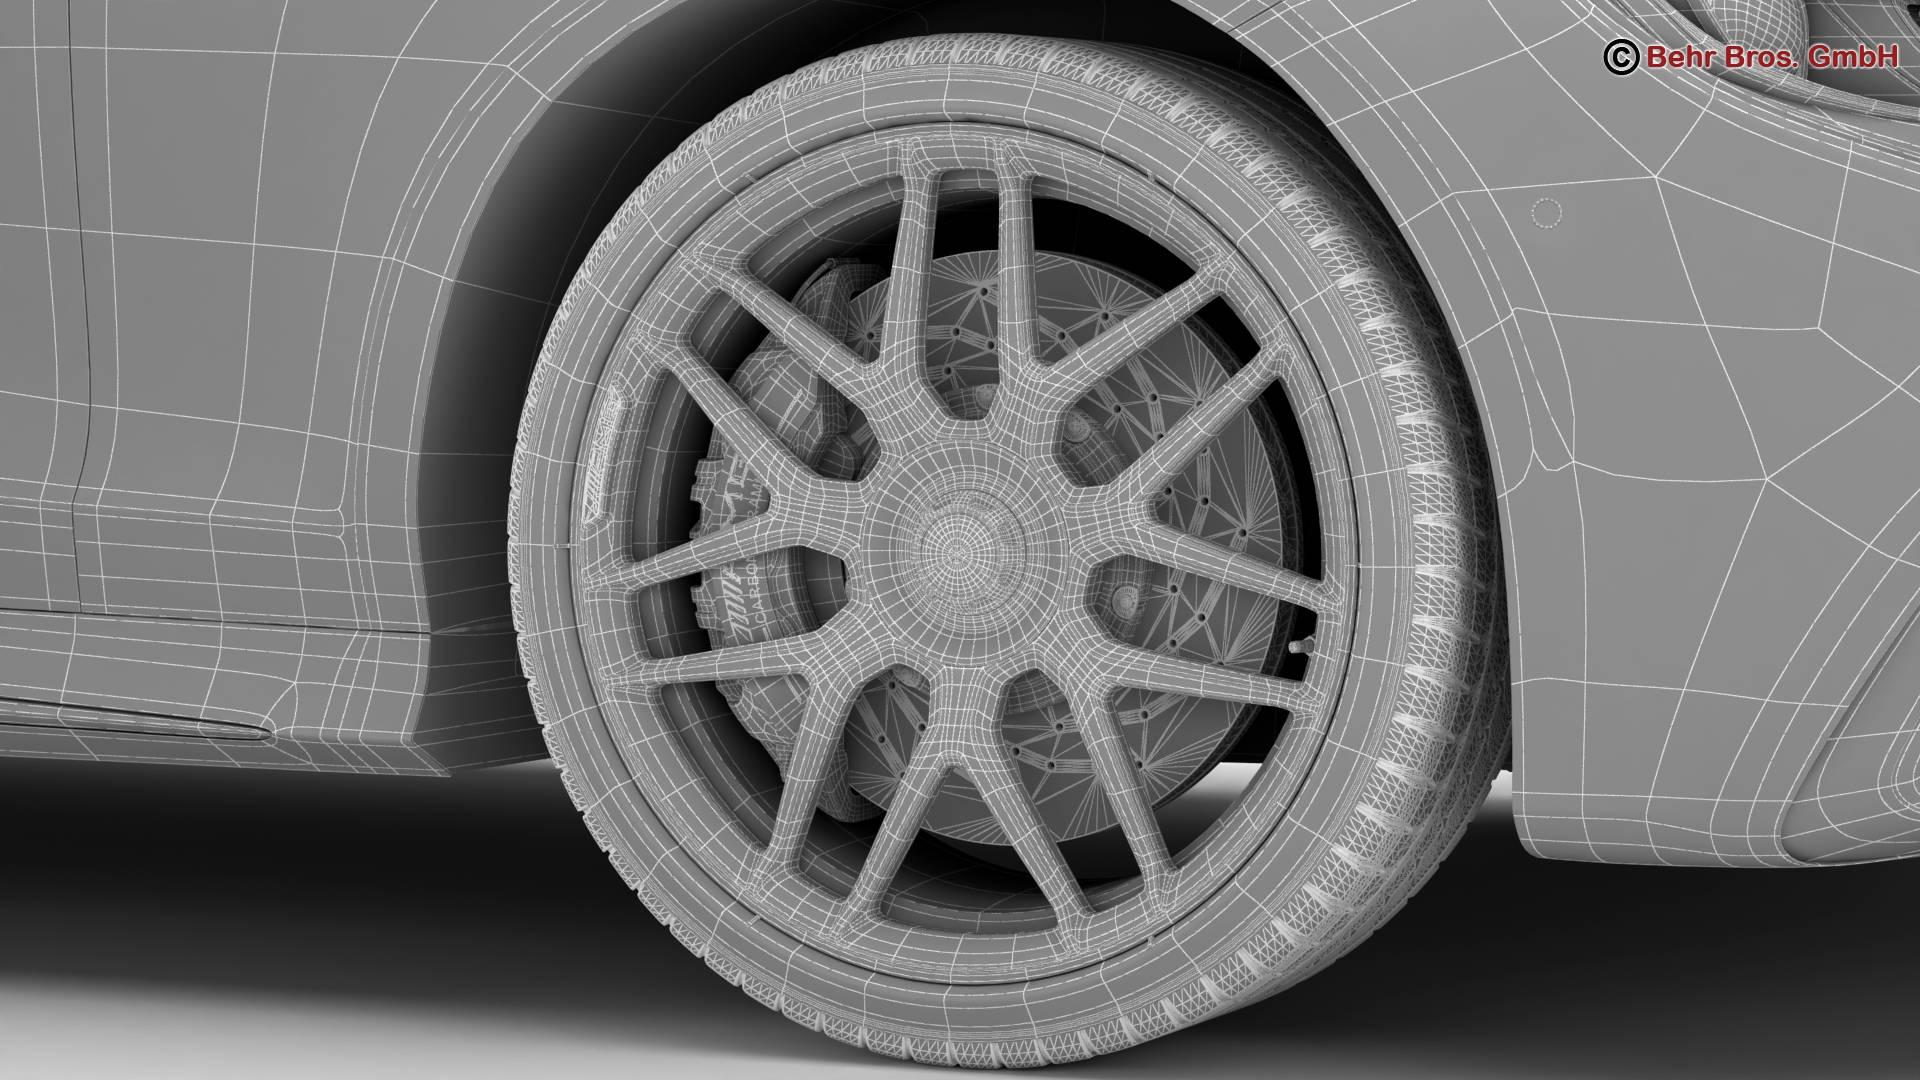 mercedes s klase kupeja s63 2018 3d modelis 3ds max fbx c4d lwo ma mb obj 274112